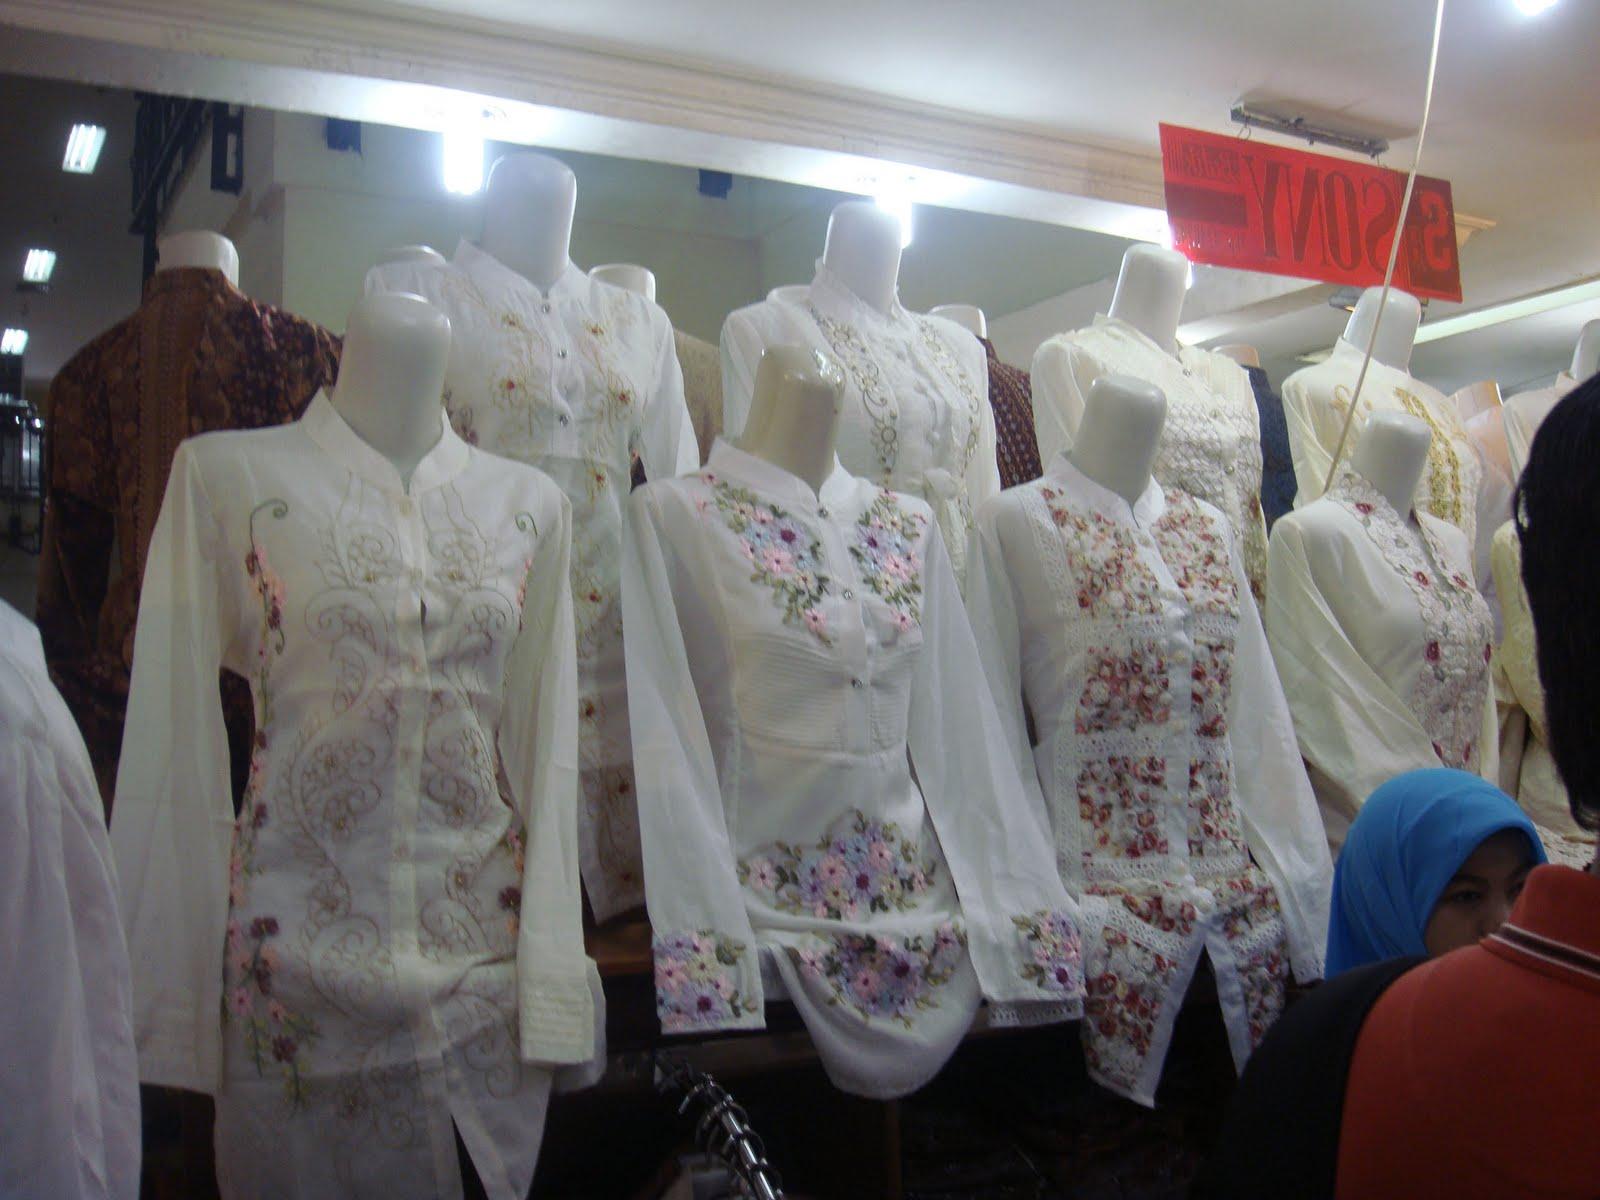 Pusat borong baju murah home Baju gamis pasar baru bandung